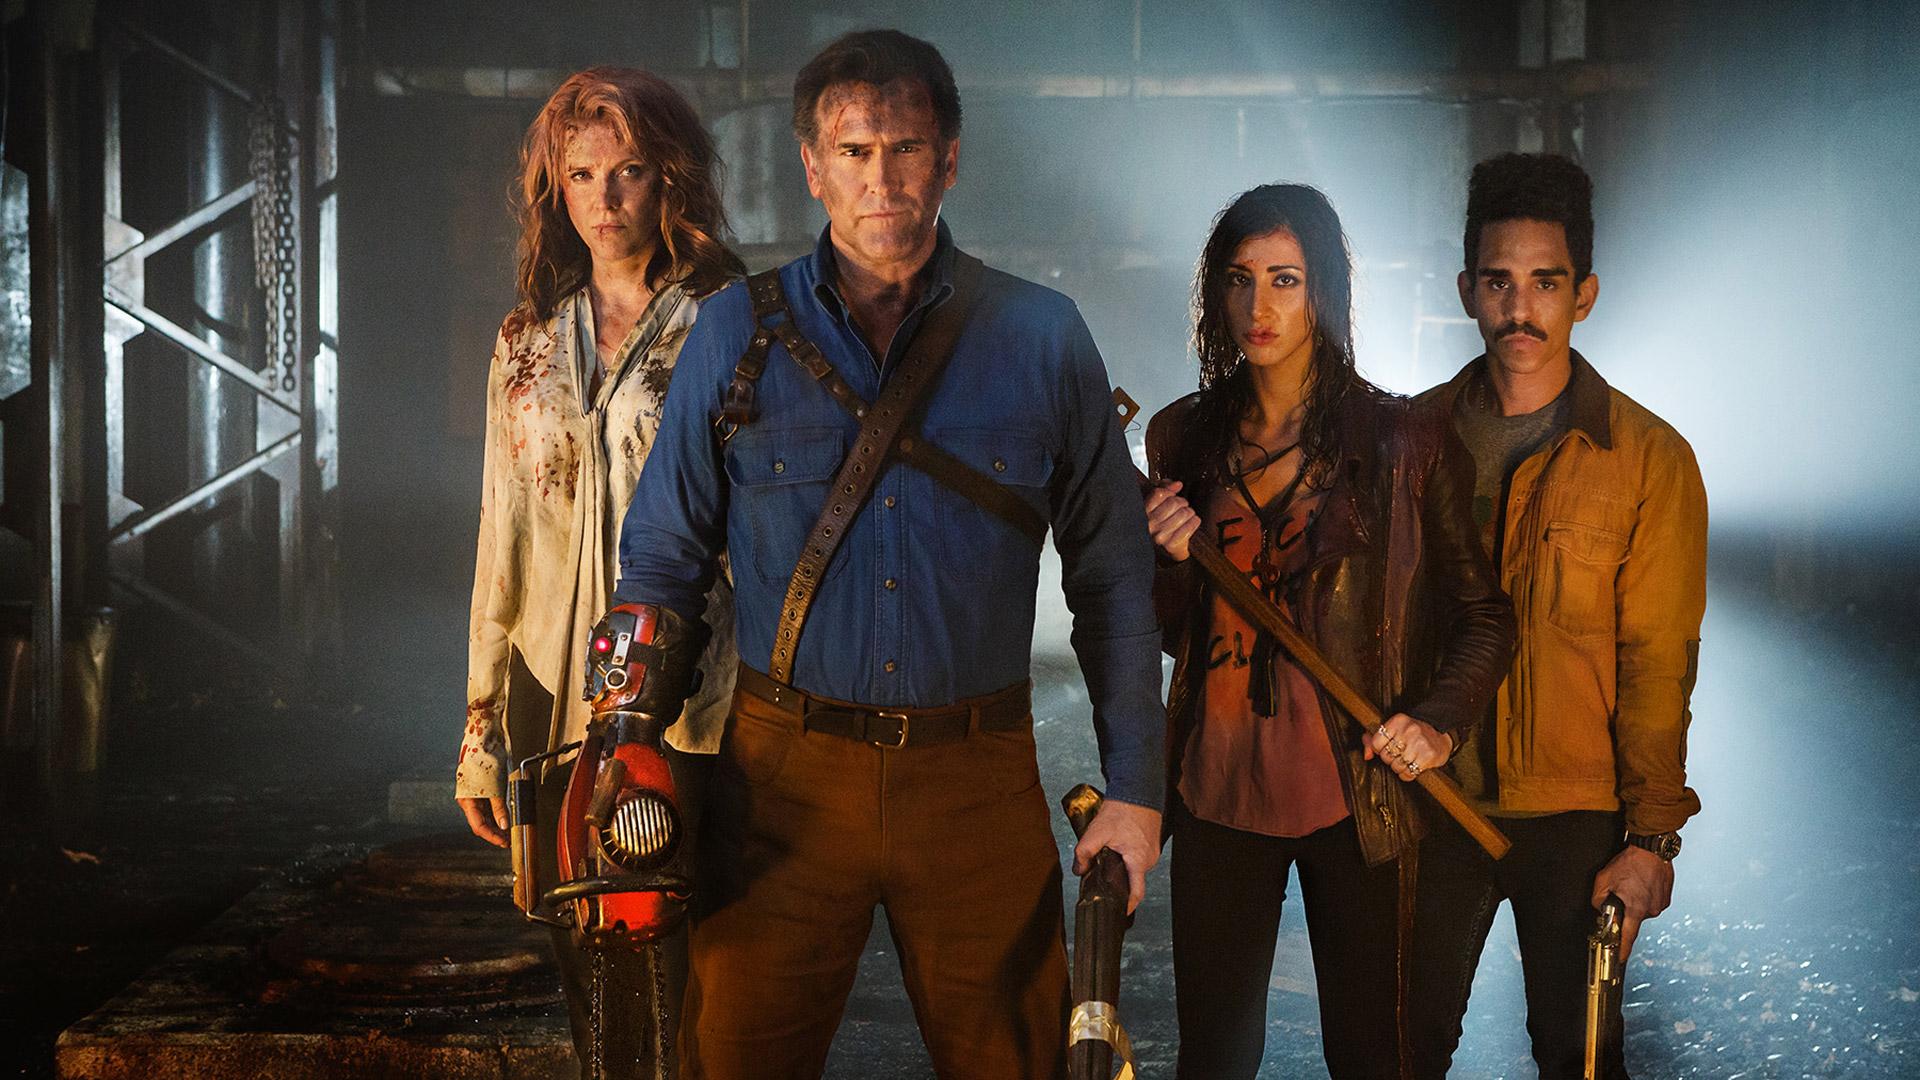 Ash Vs Evil Dead Season 2 Hd Tv Shows 4k Wallpapers Images